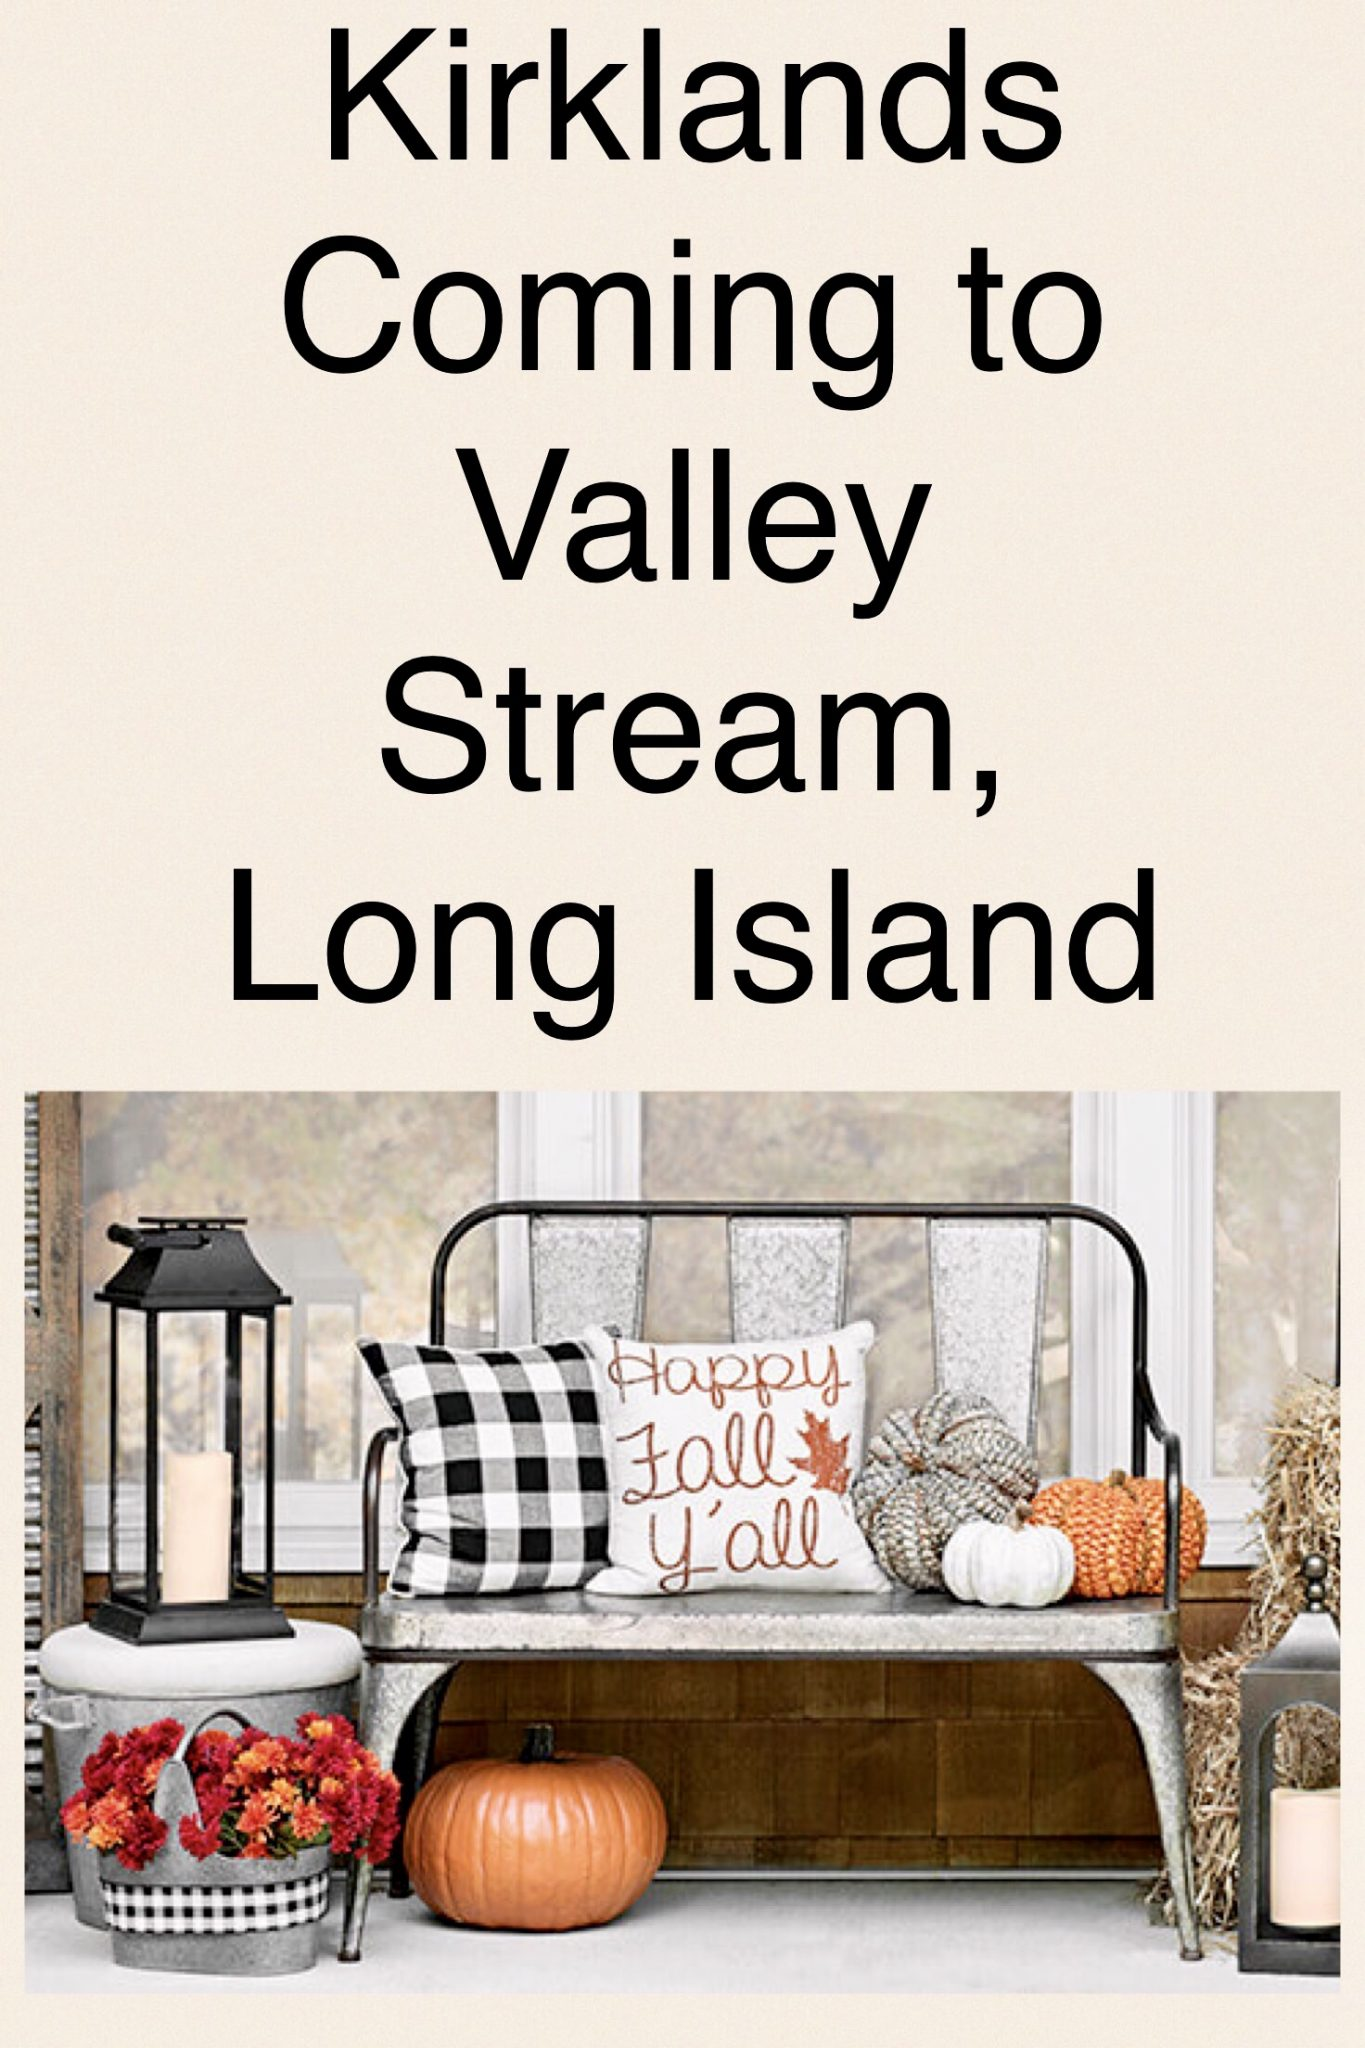 Kirklands Opening New Store Valley Stream, Long Island